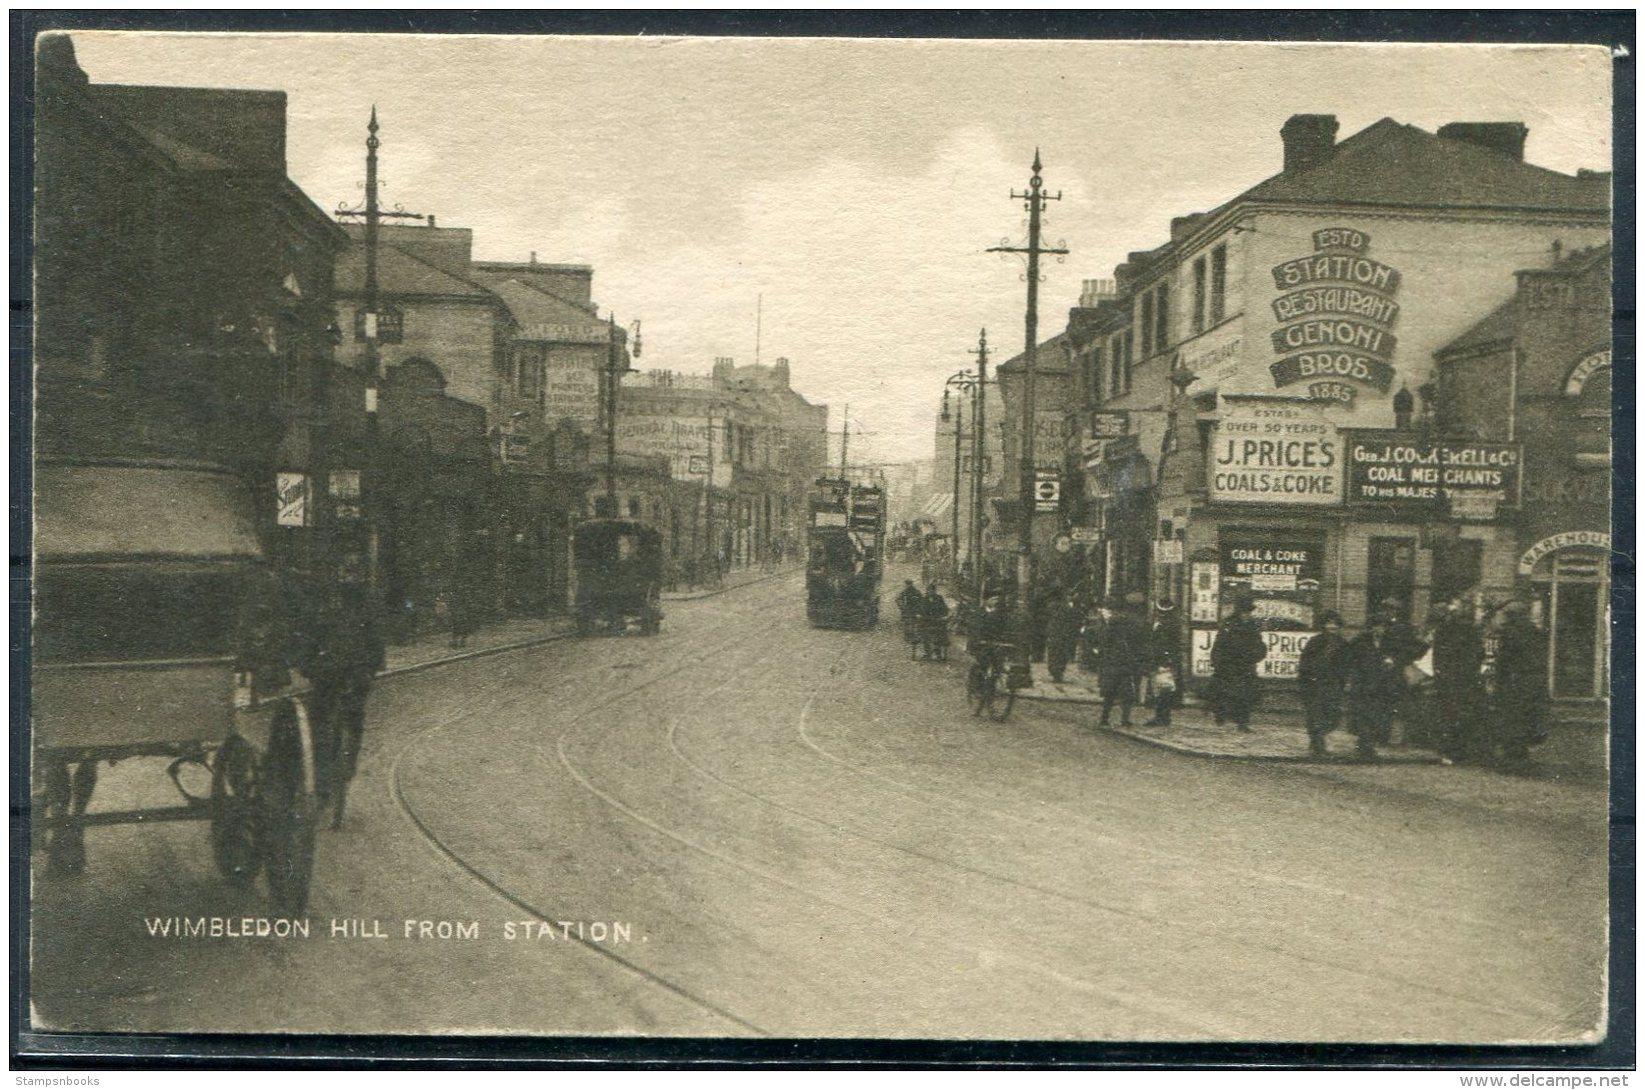 Wimbledon Hill From Station, YMCA Postcard - Surrey